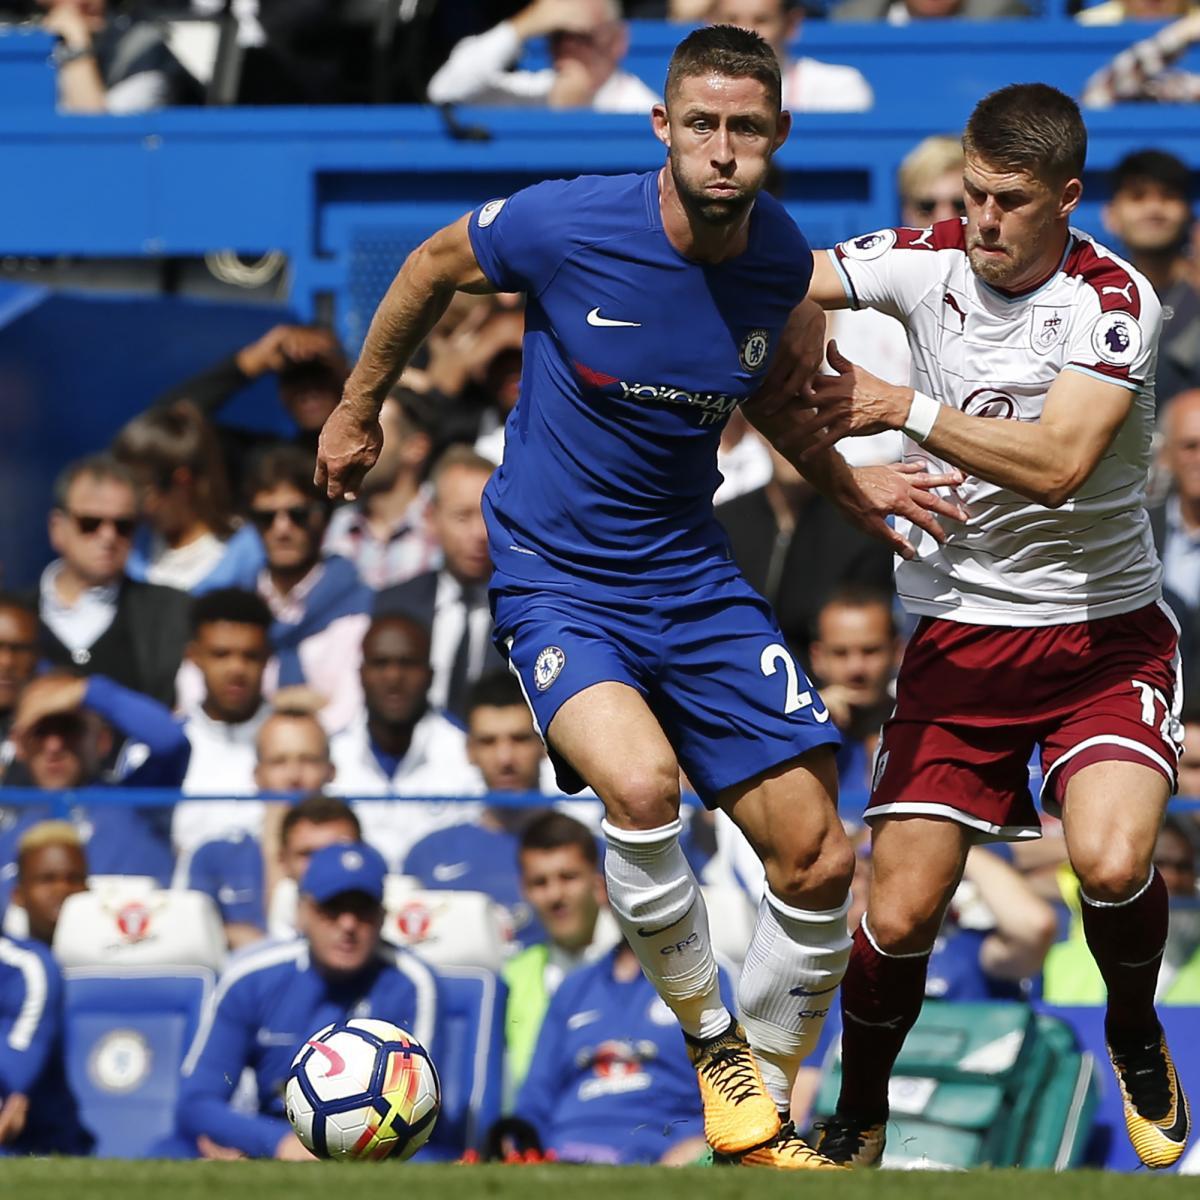 Burnley vs. Chelsea: Team News, Preview, Live Stream, TV Info